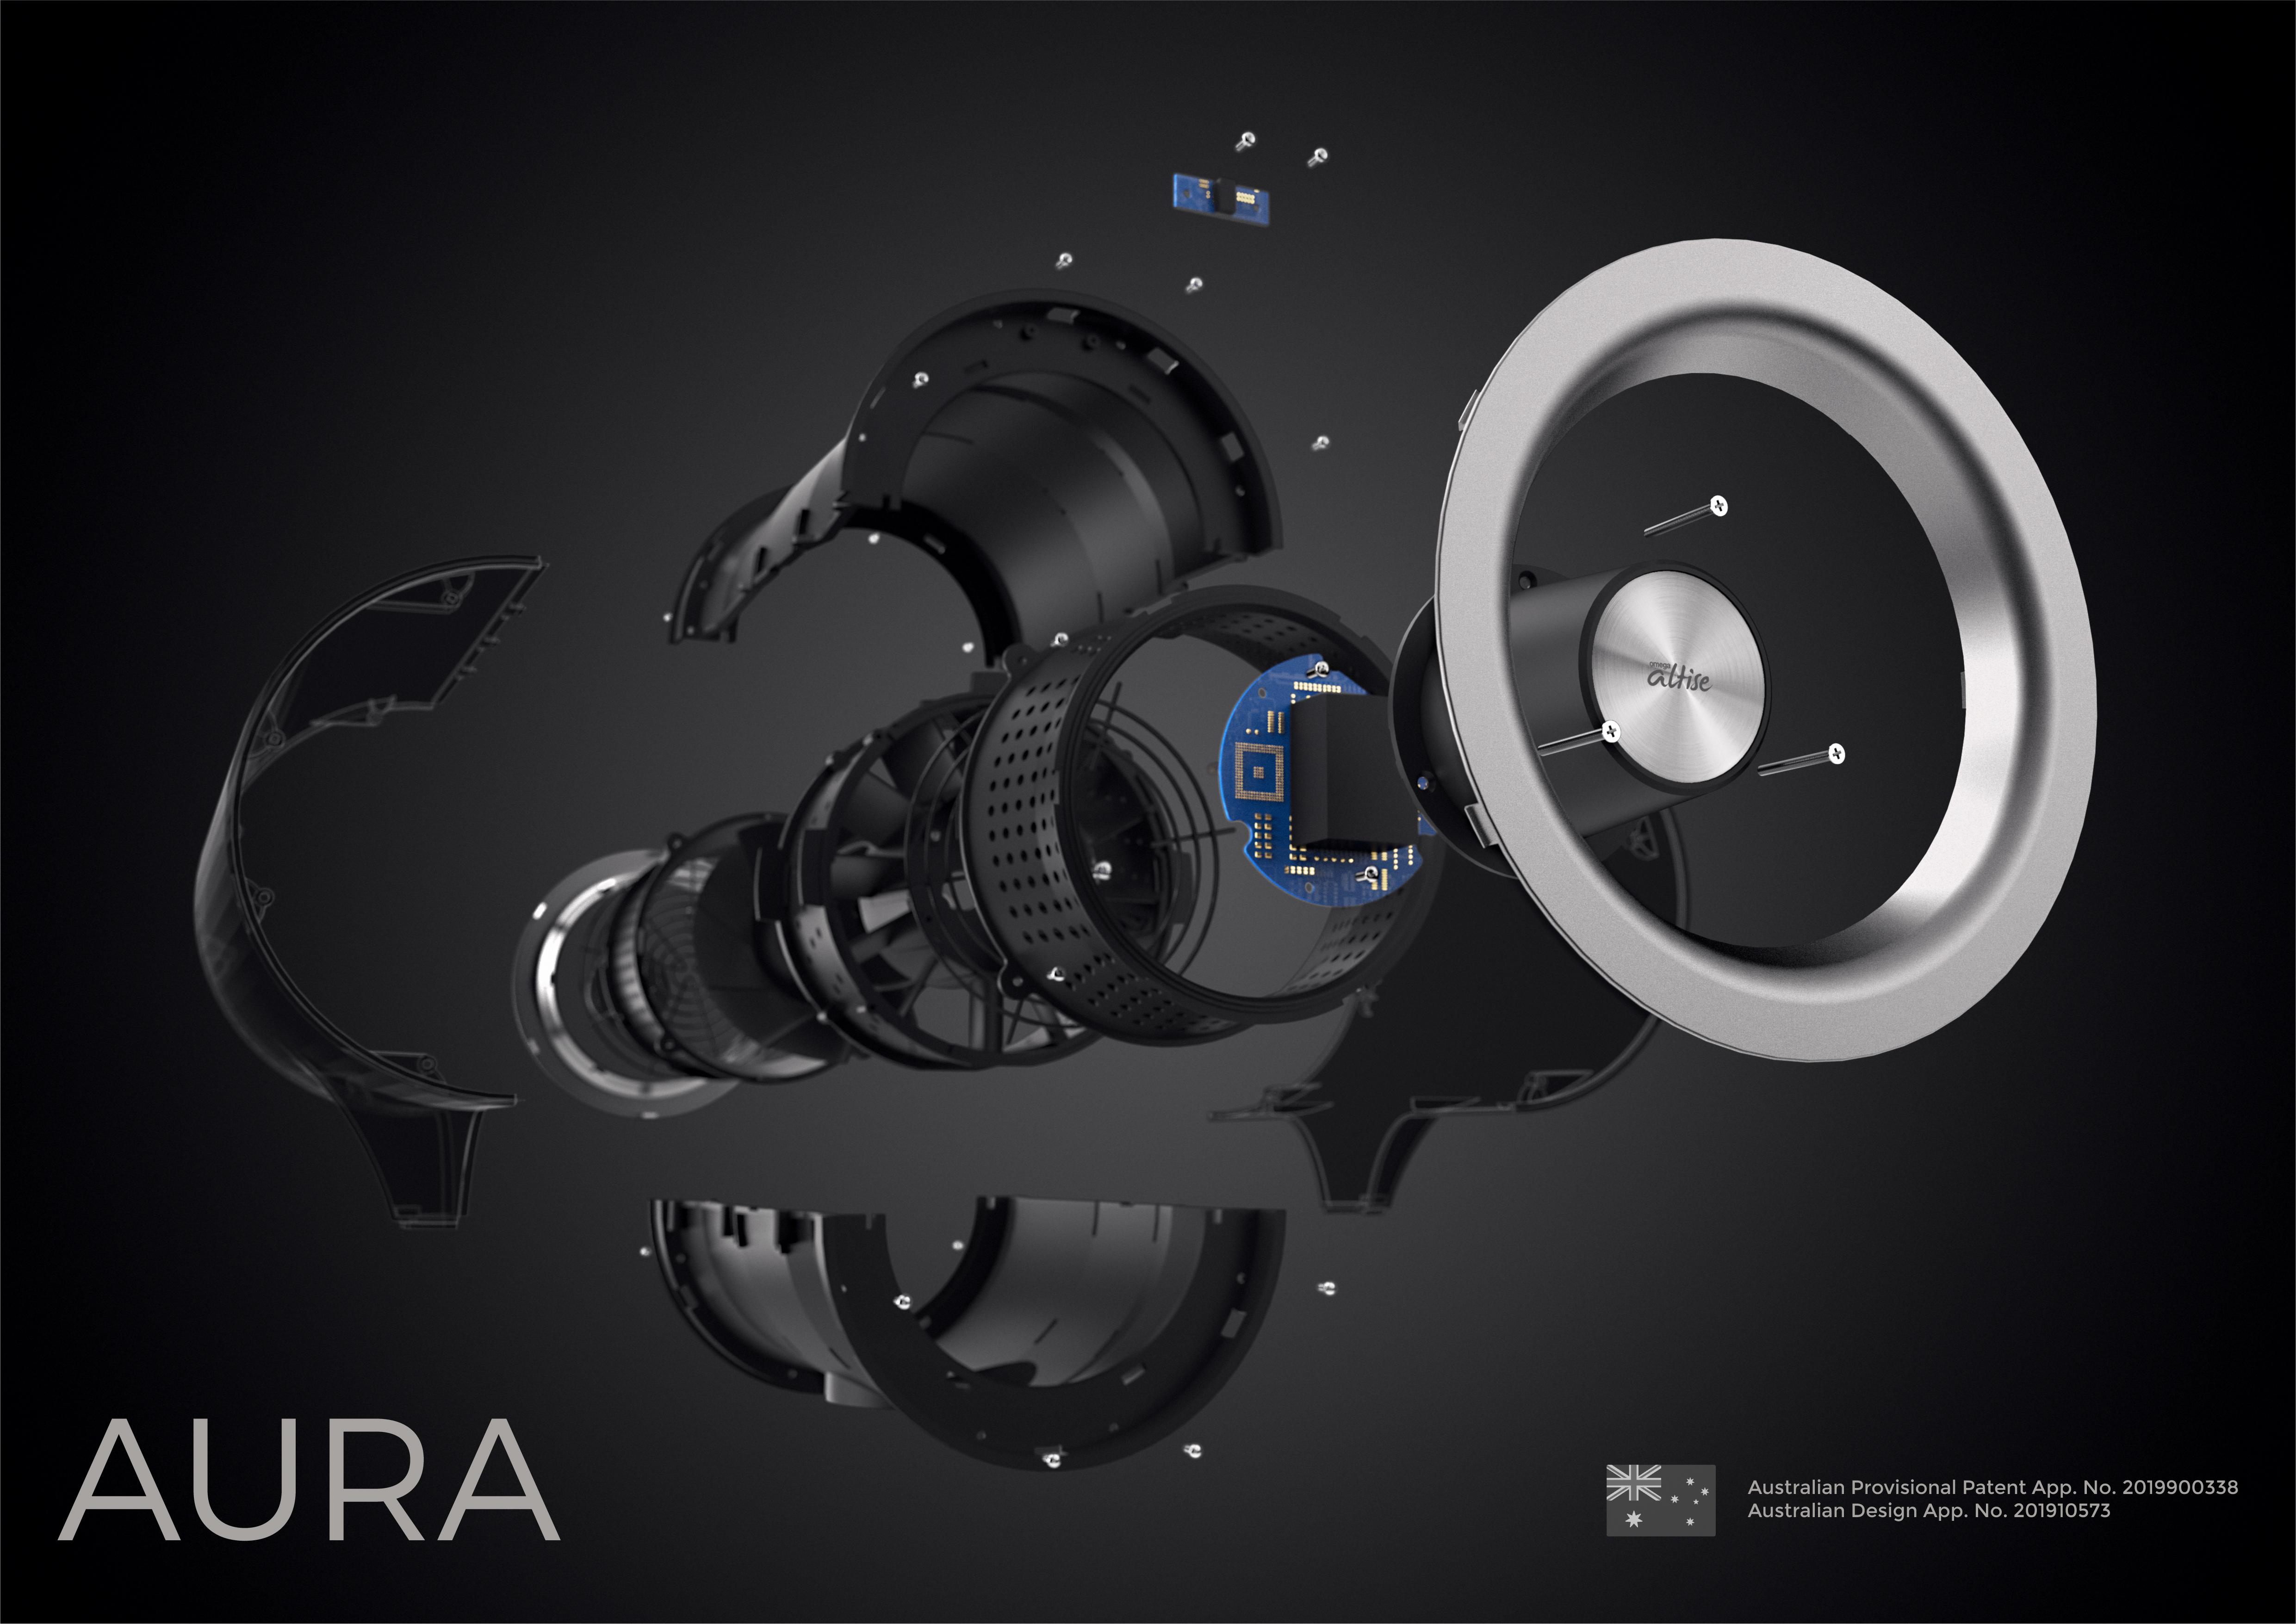 Omega Altise Product Aura Pedestal Fan 12.5cm - White(OP125W)